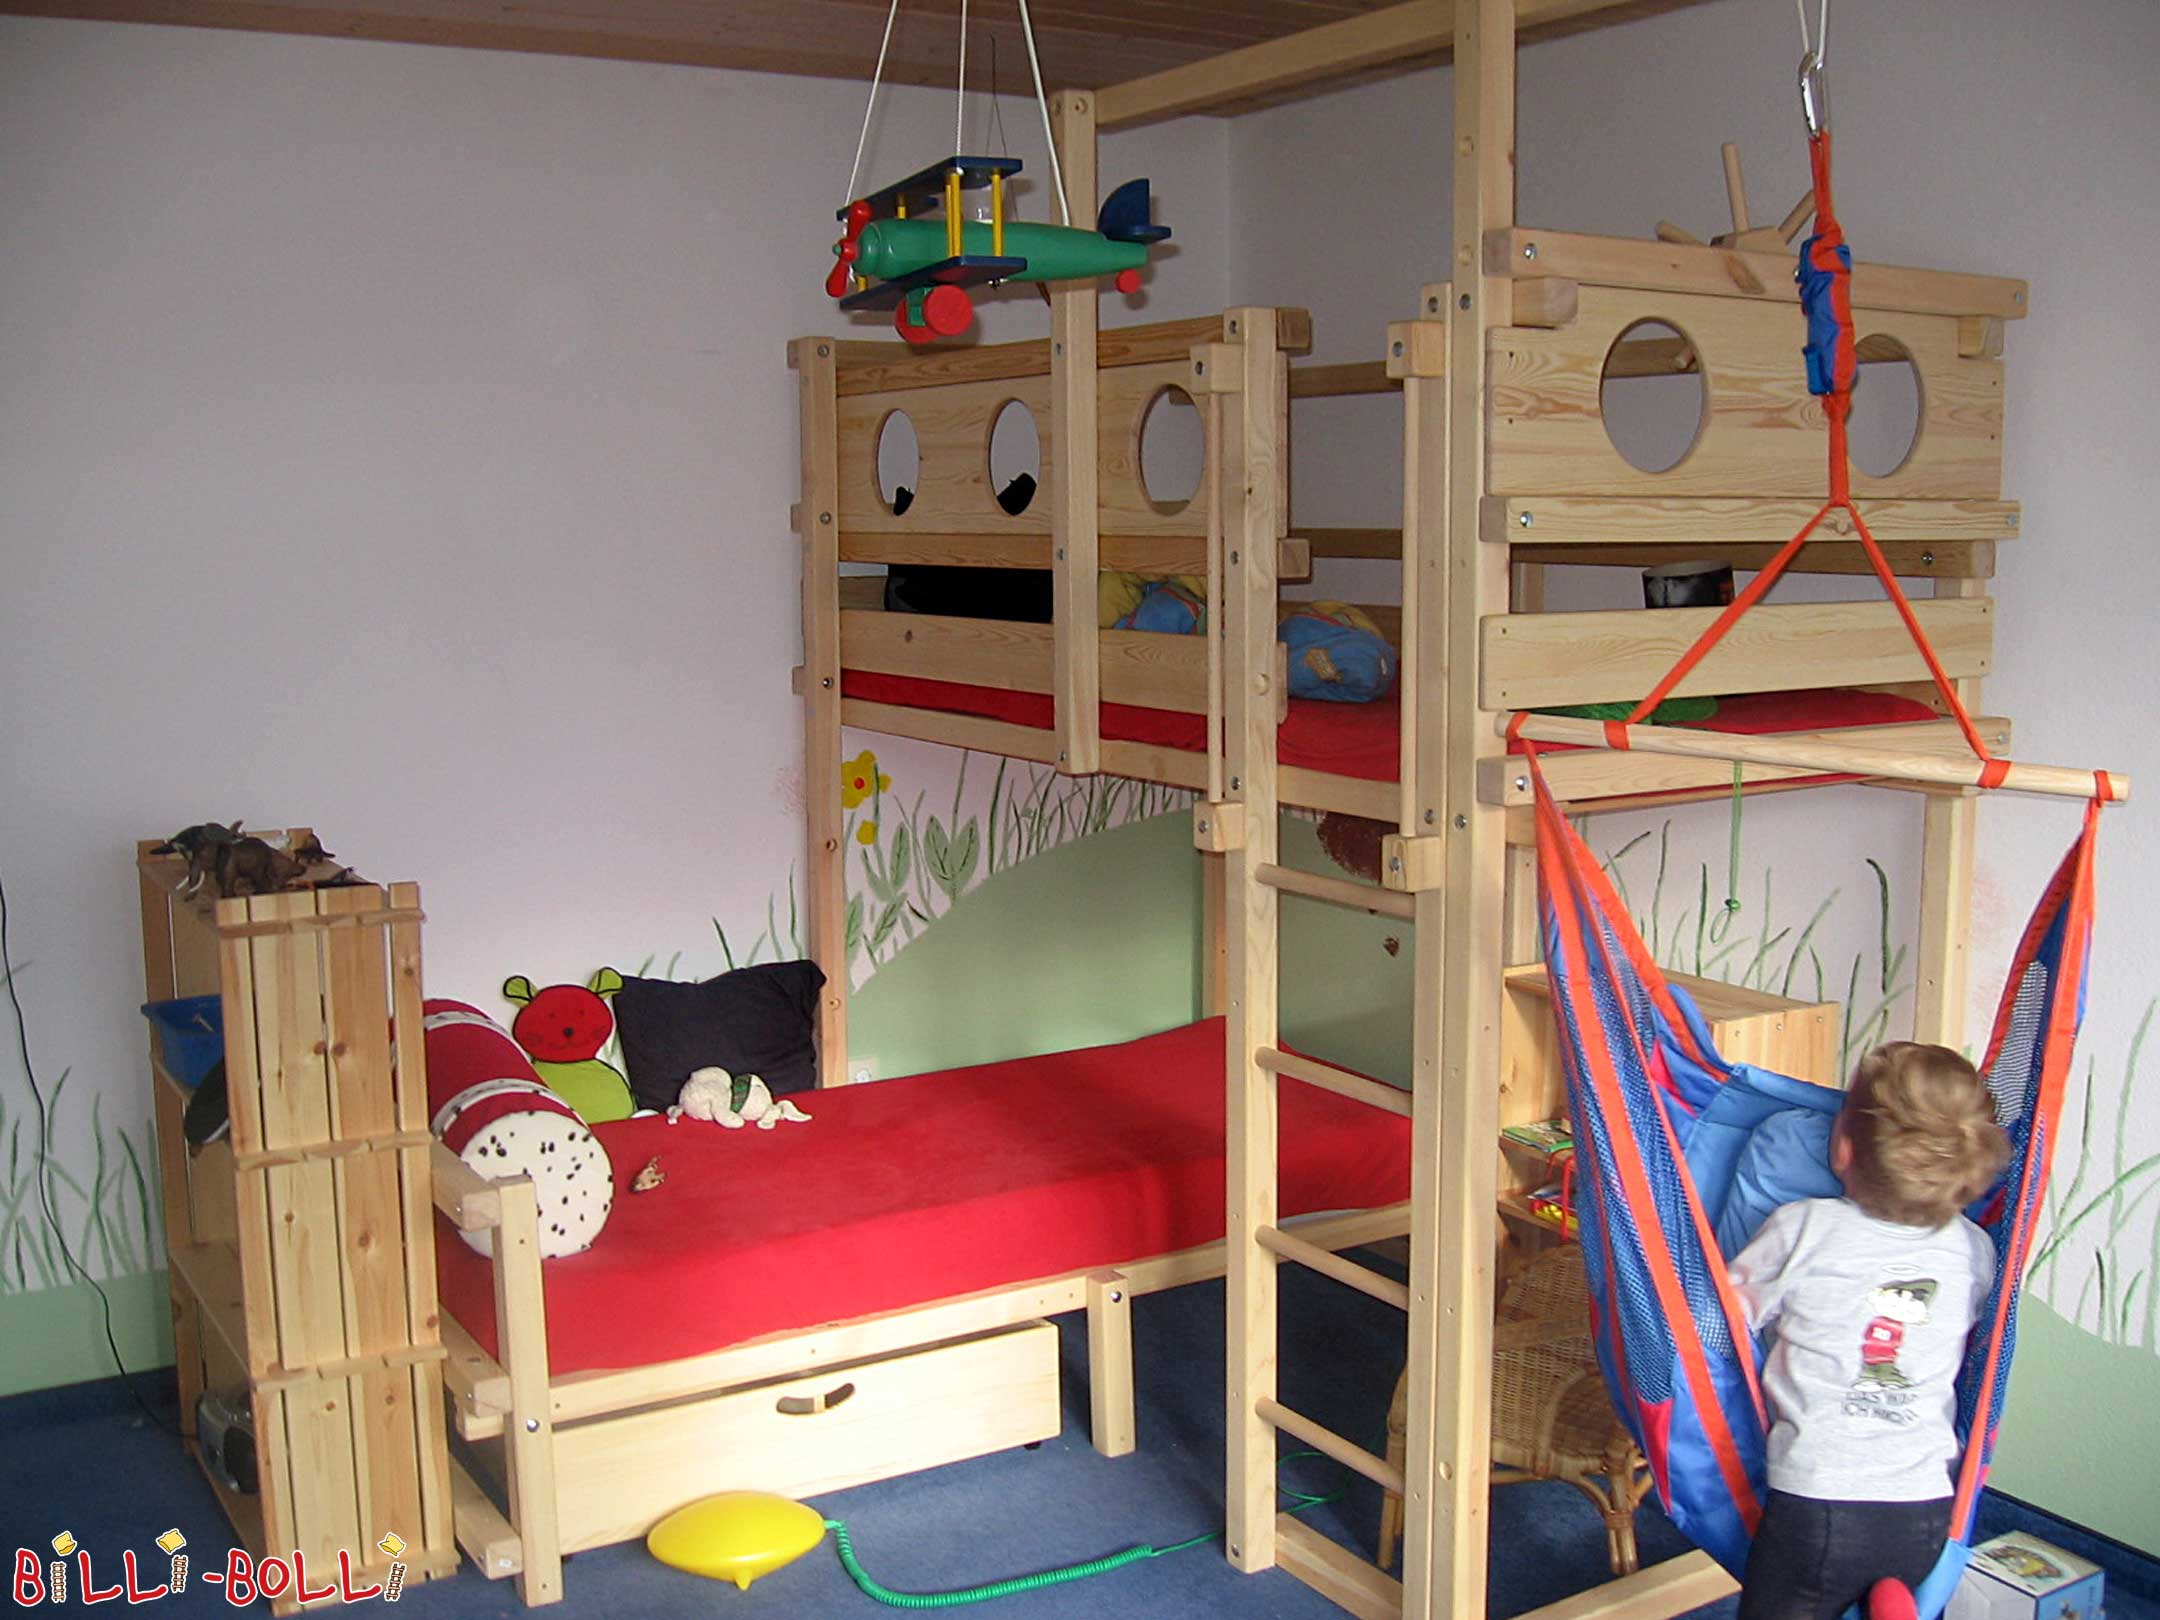 Etagenbett Ecke : Etagenbett über eck billi bolli kindermöbel